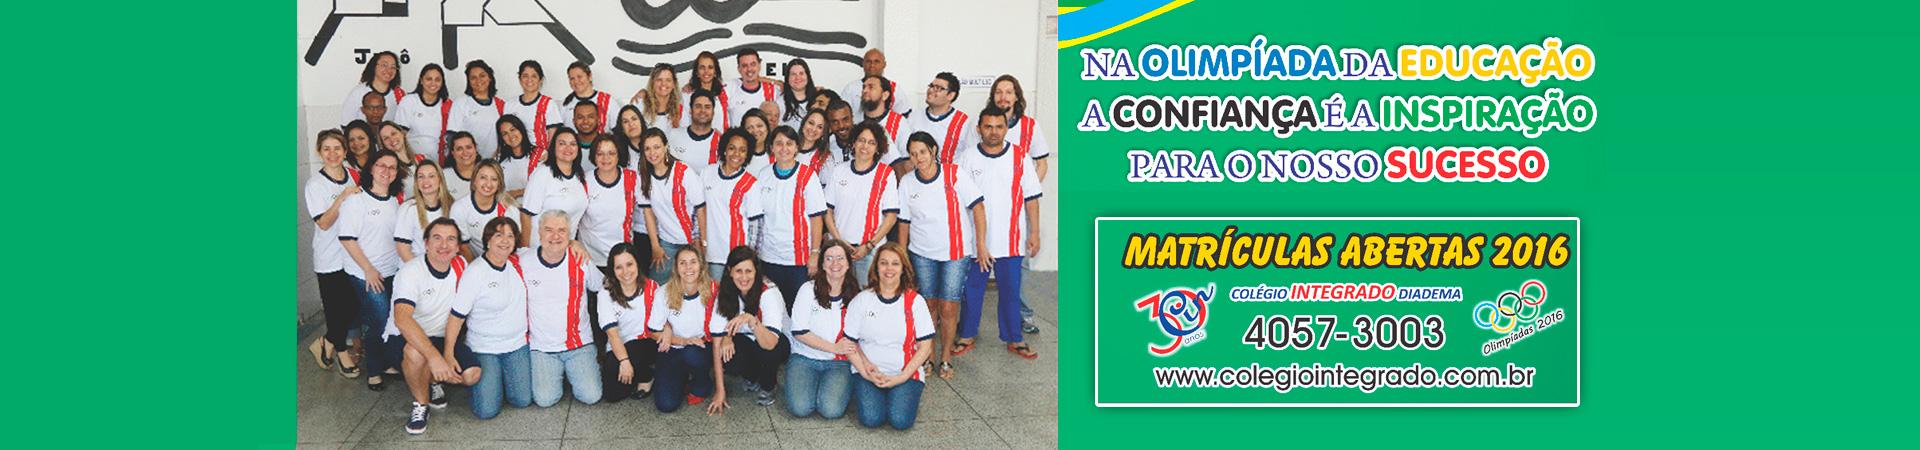 banner_matriculas1